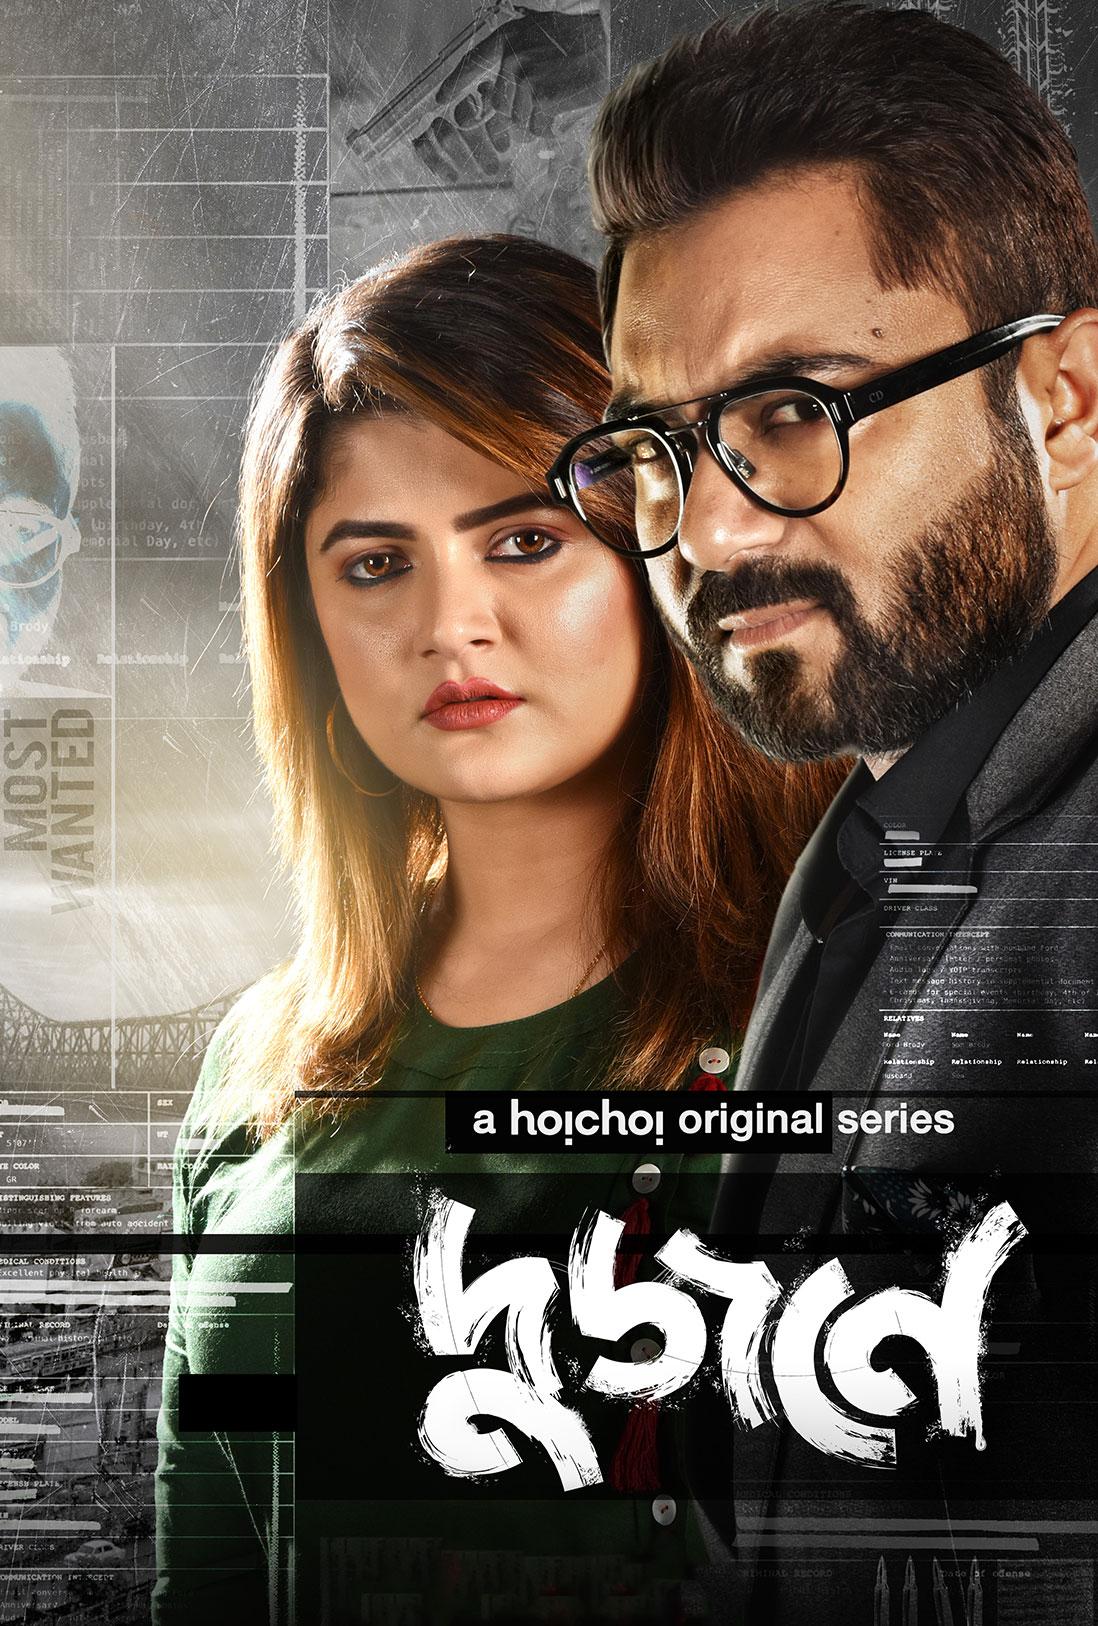 Dujone 2021 S01 Hoichoi Originals Bengali Complete Web Series 720p HDRip 1.7GB Download